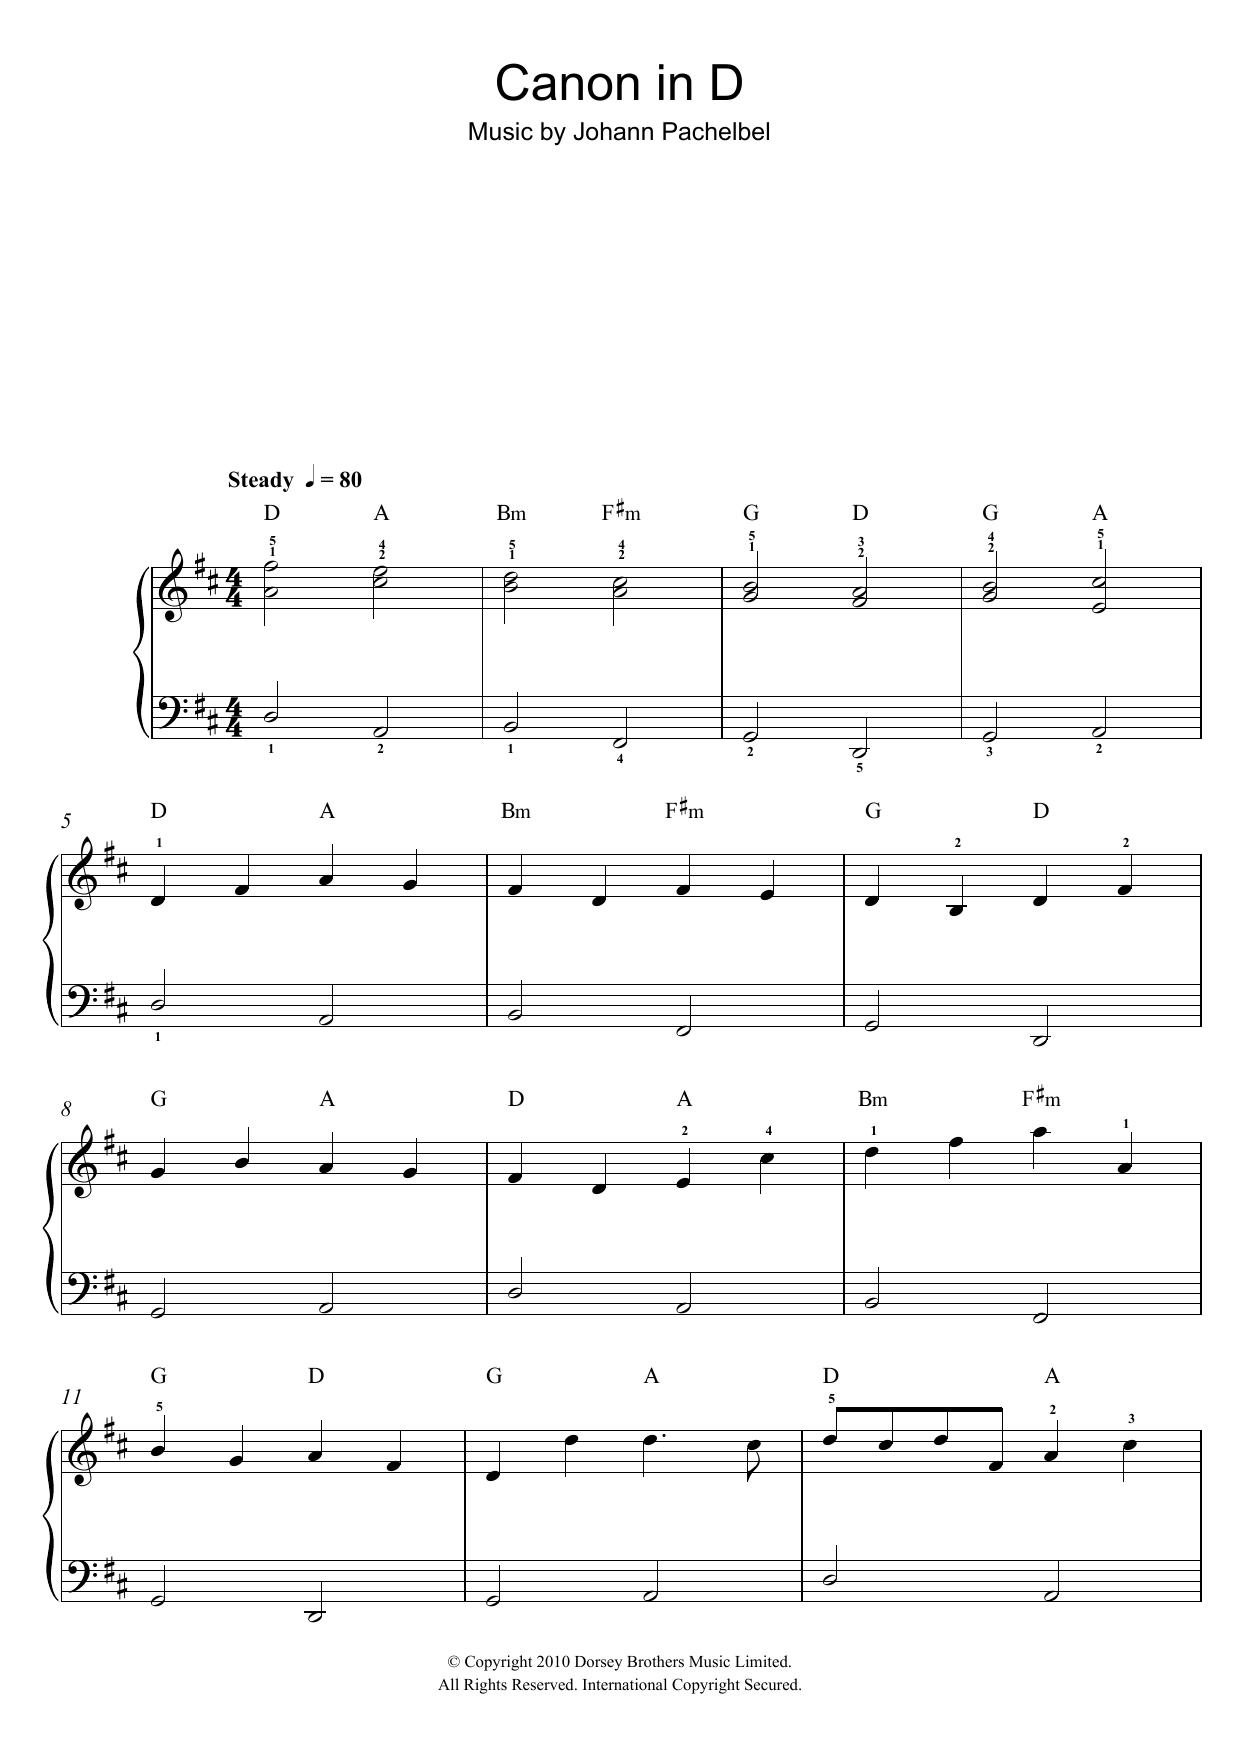 Sheet Music Digital Files To Print Licensed Johann Pachelbel